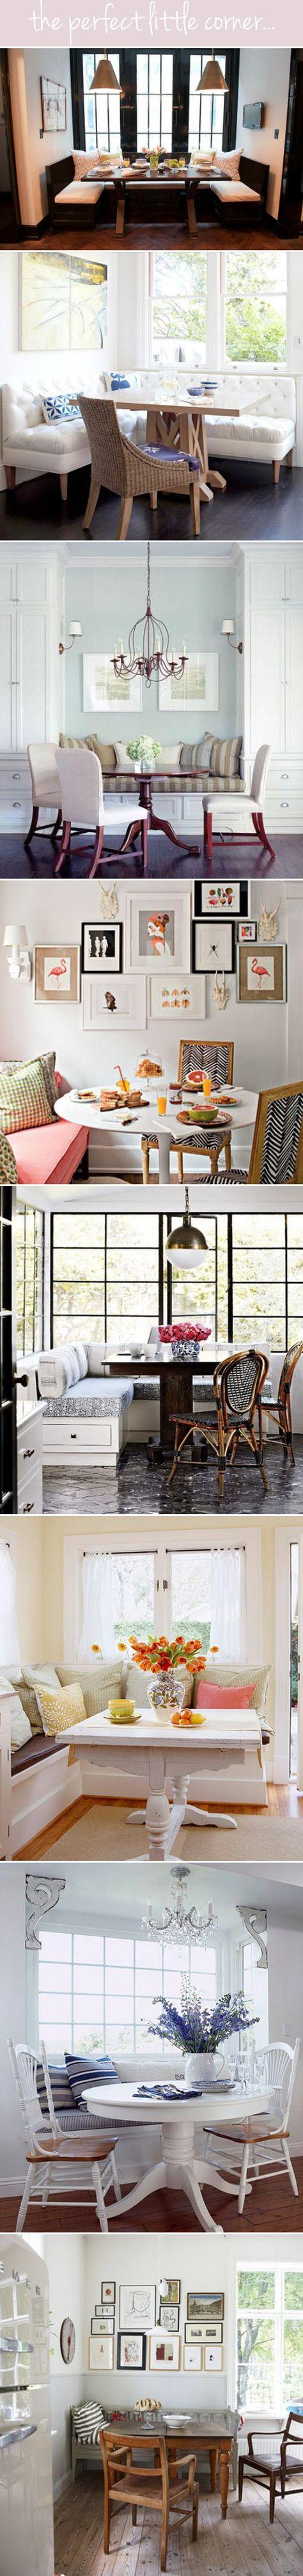 Beautiful Breakfast nooks. Love the zigzag chair one.